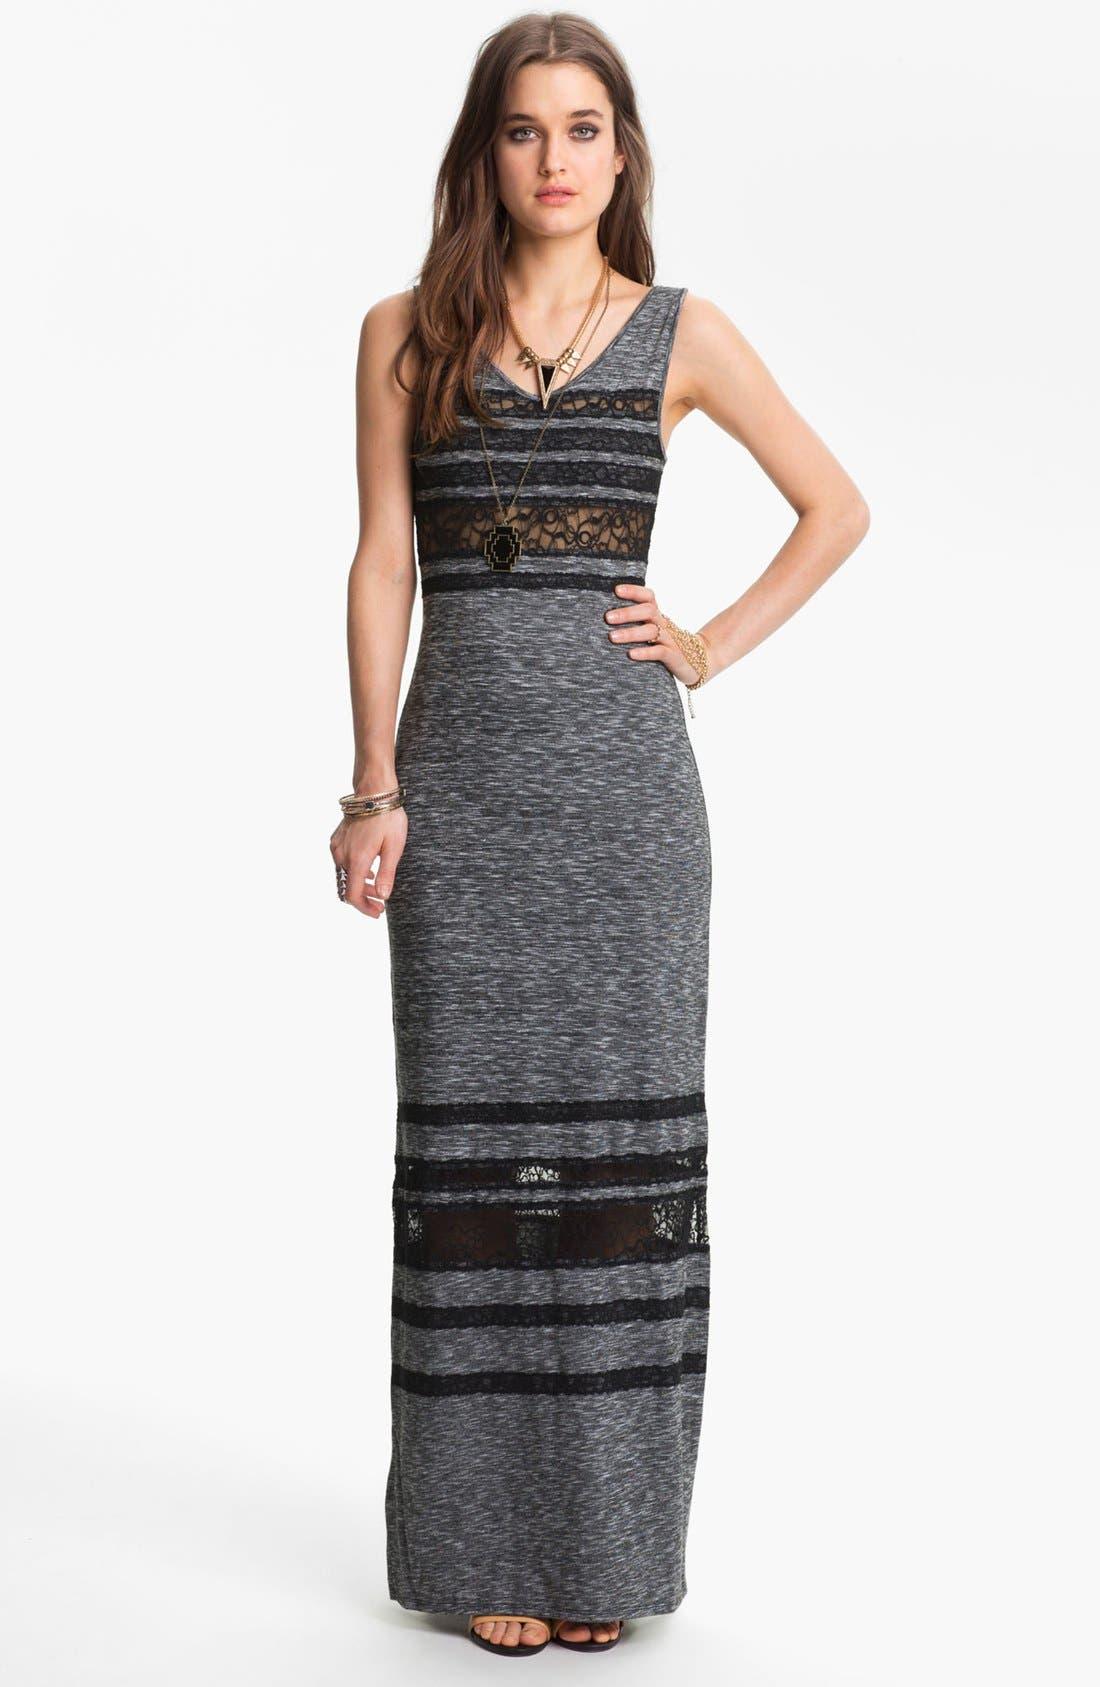 Alternate Image 1 Selected - Free People 'Hazy Day' Lace Stripe Maxi Dress